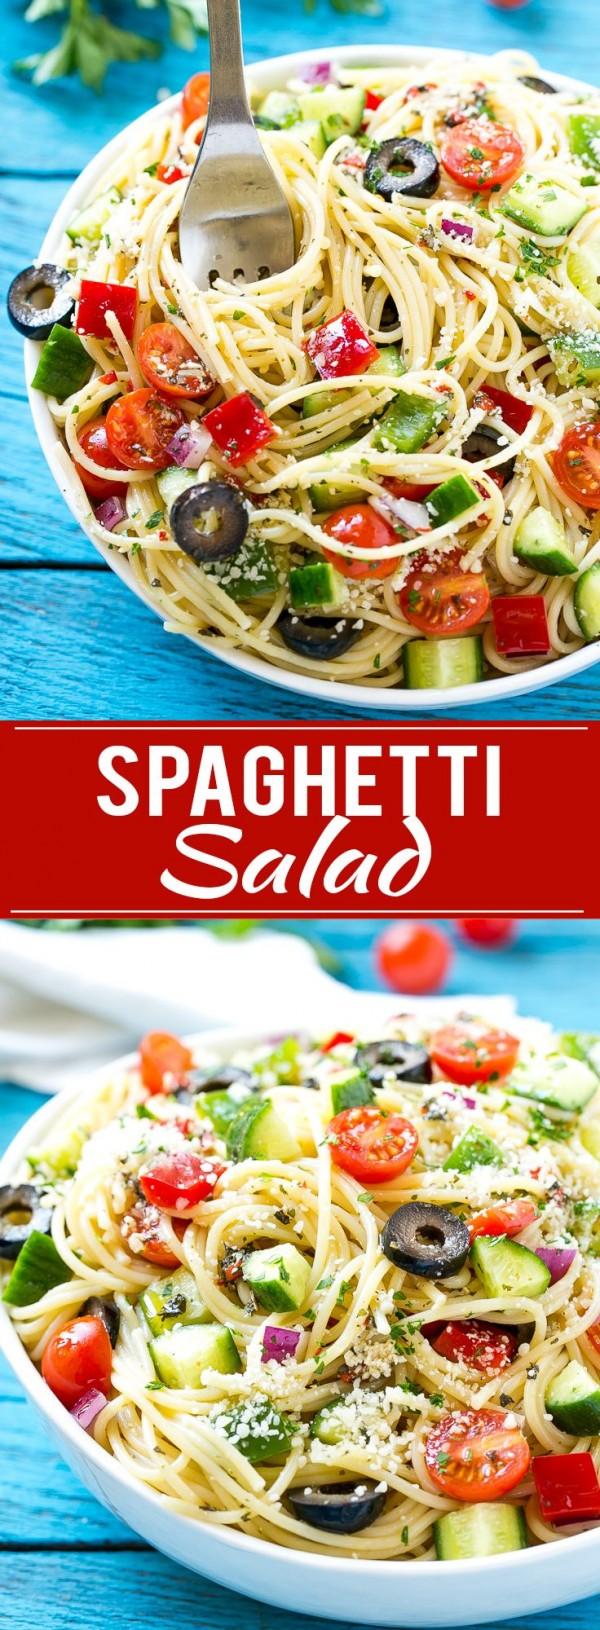 Get the recipe Spaghetti Salad @recipes_to_go